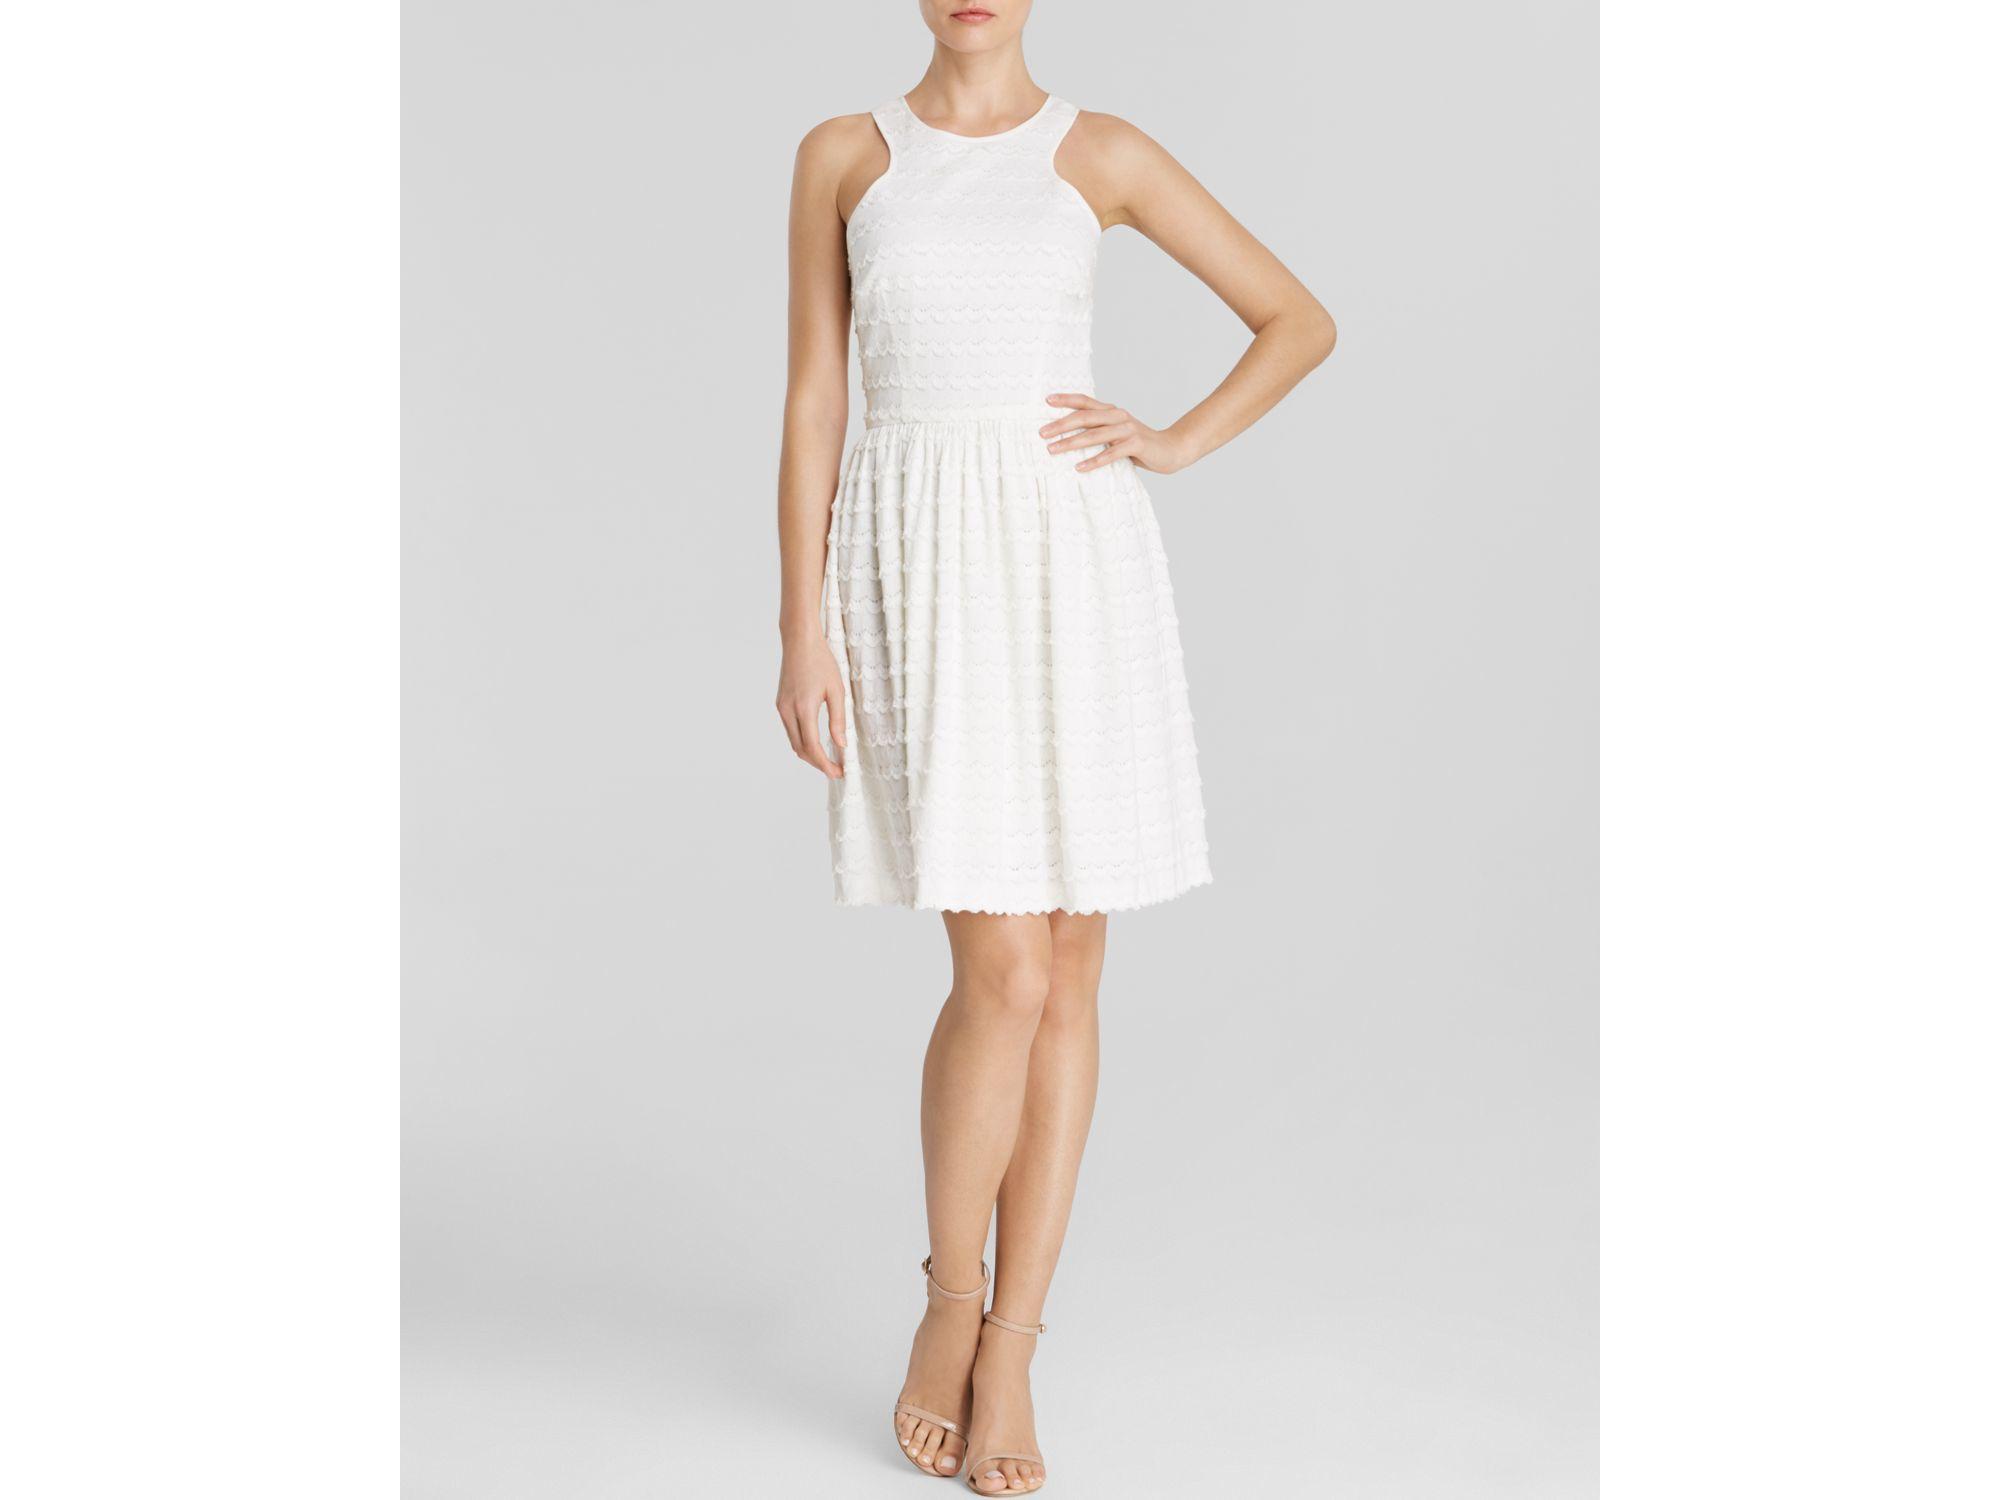 Trina turk Dress - April in White  Lyst